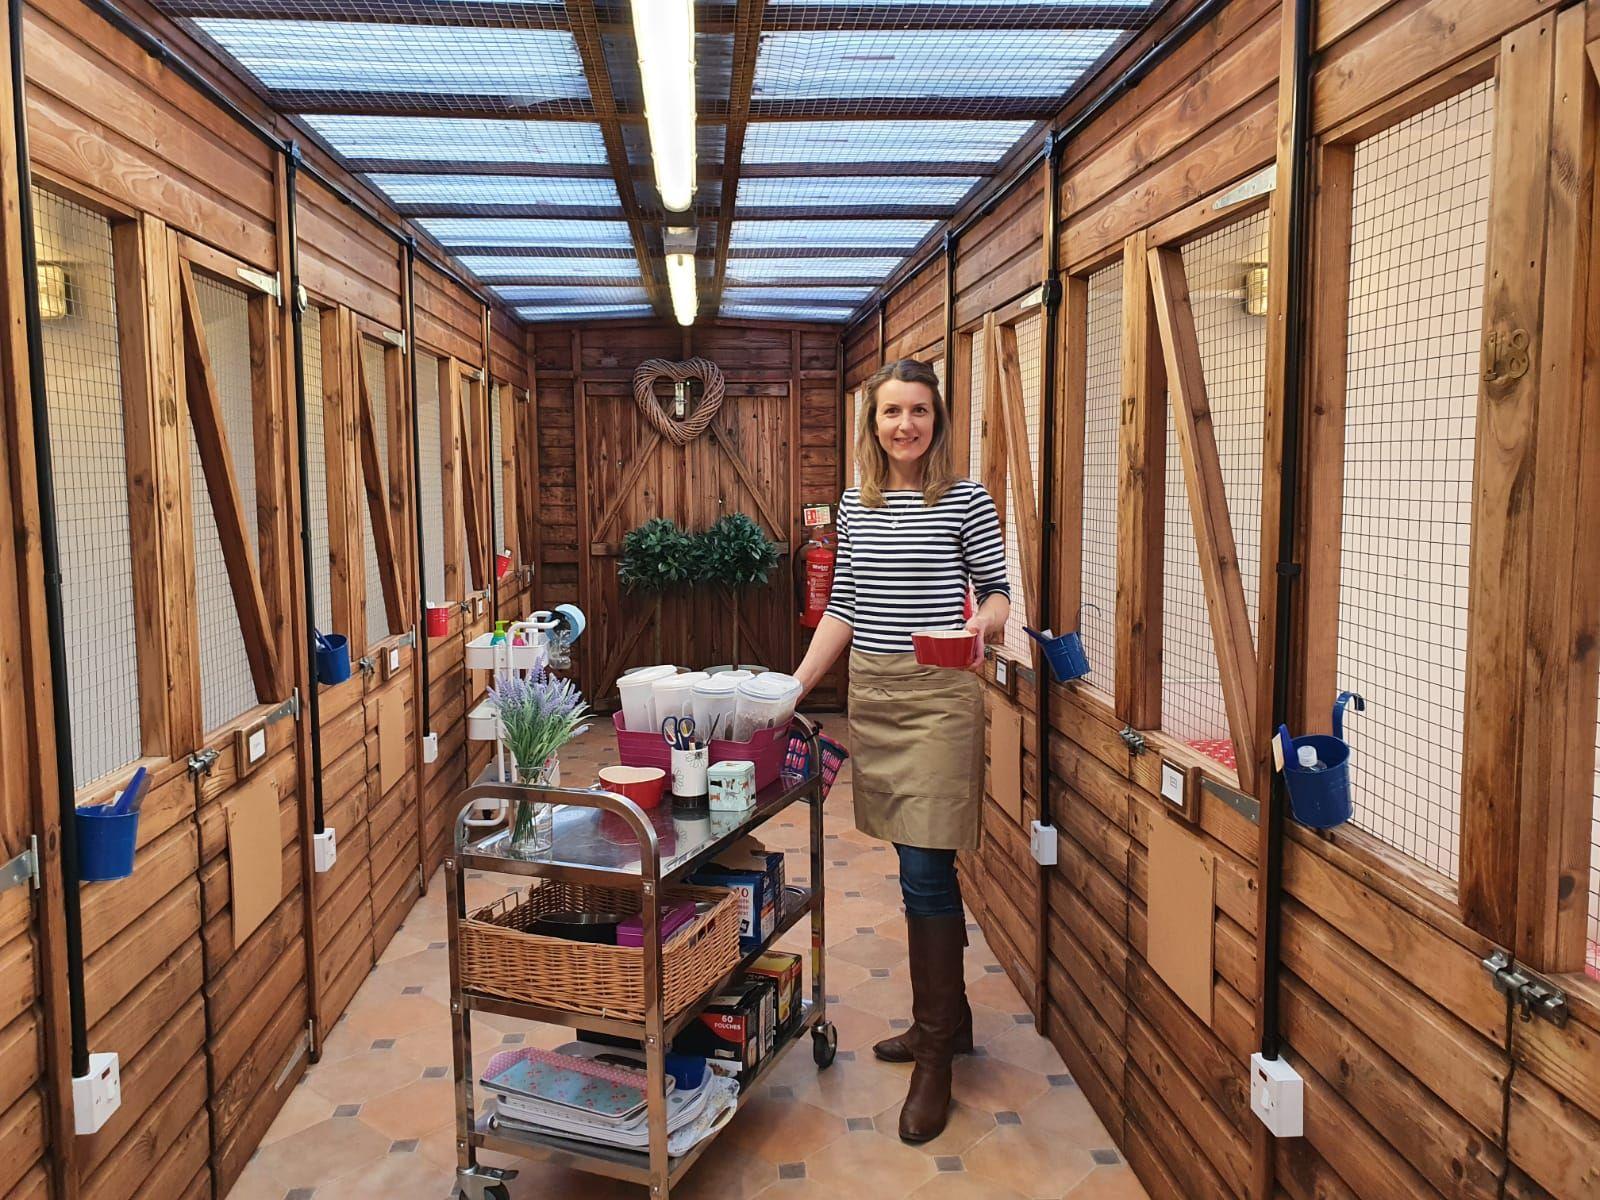 Nicola delivering meals to feline guests at Kingstone Pet Boarding